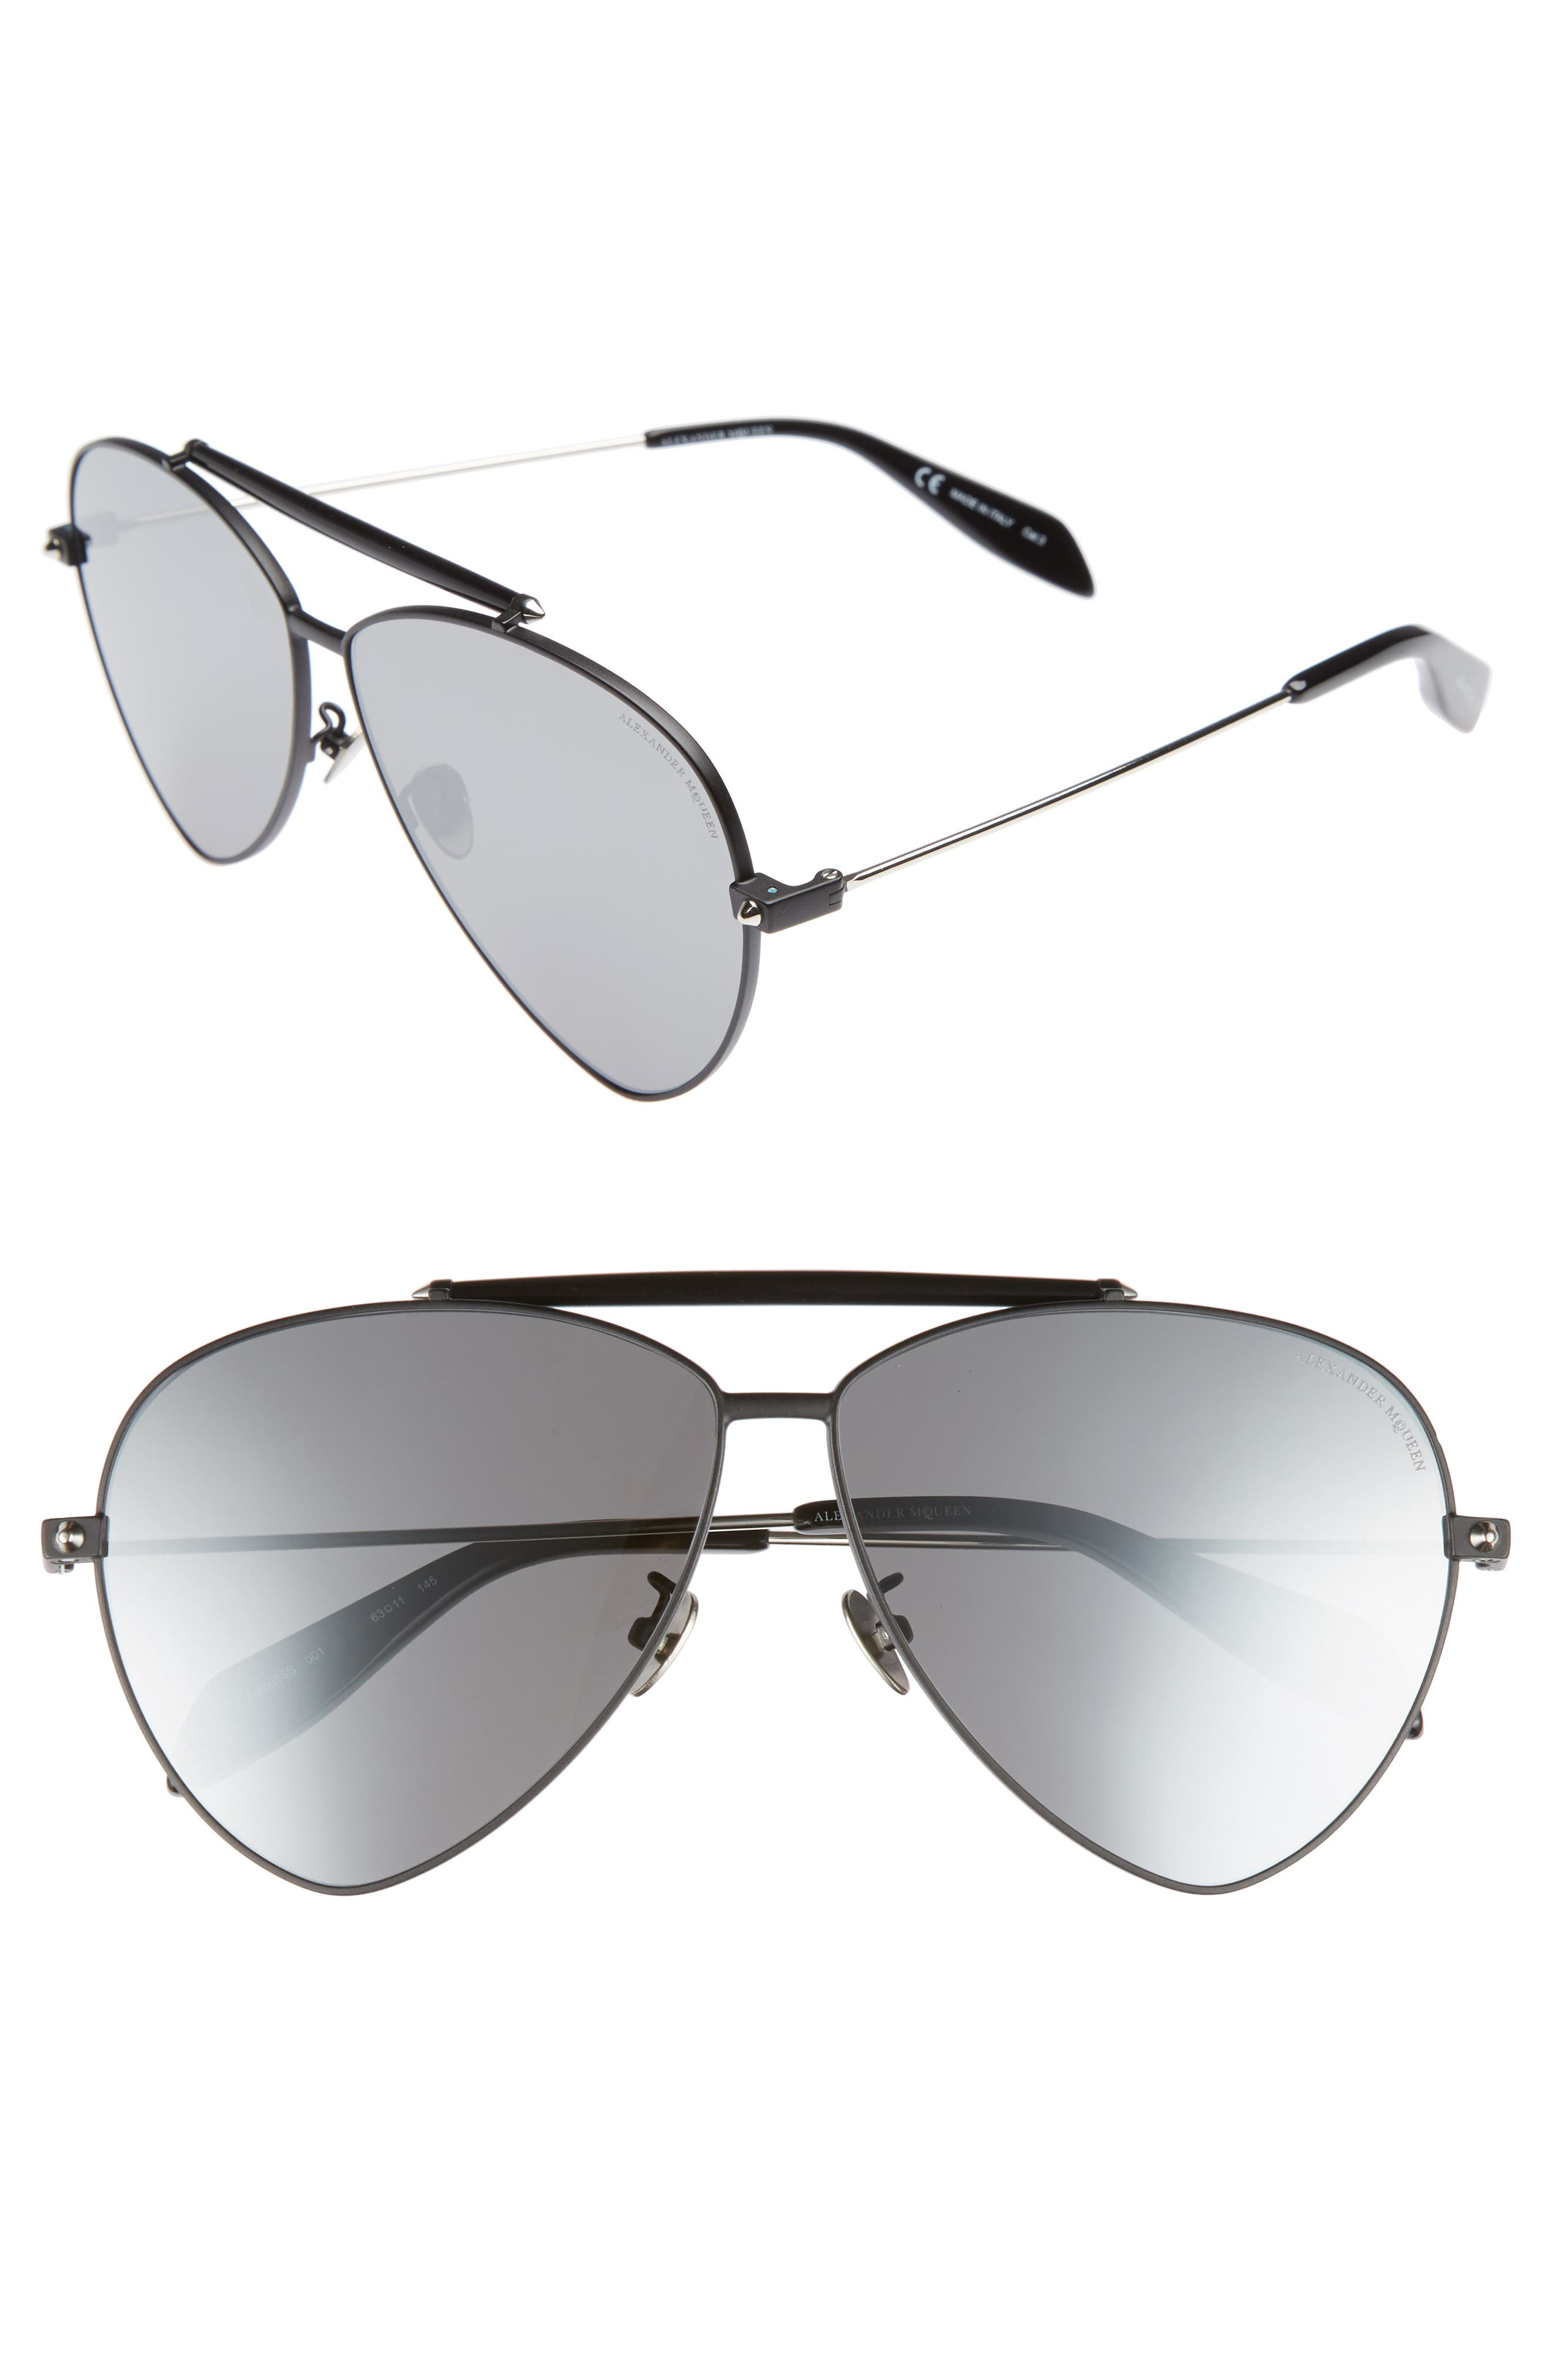 63mm Oversize Aviator Sunglasses,                             Main thumbnail 1, color,                             Black